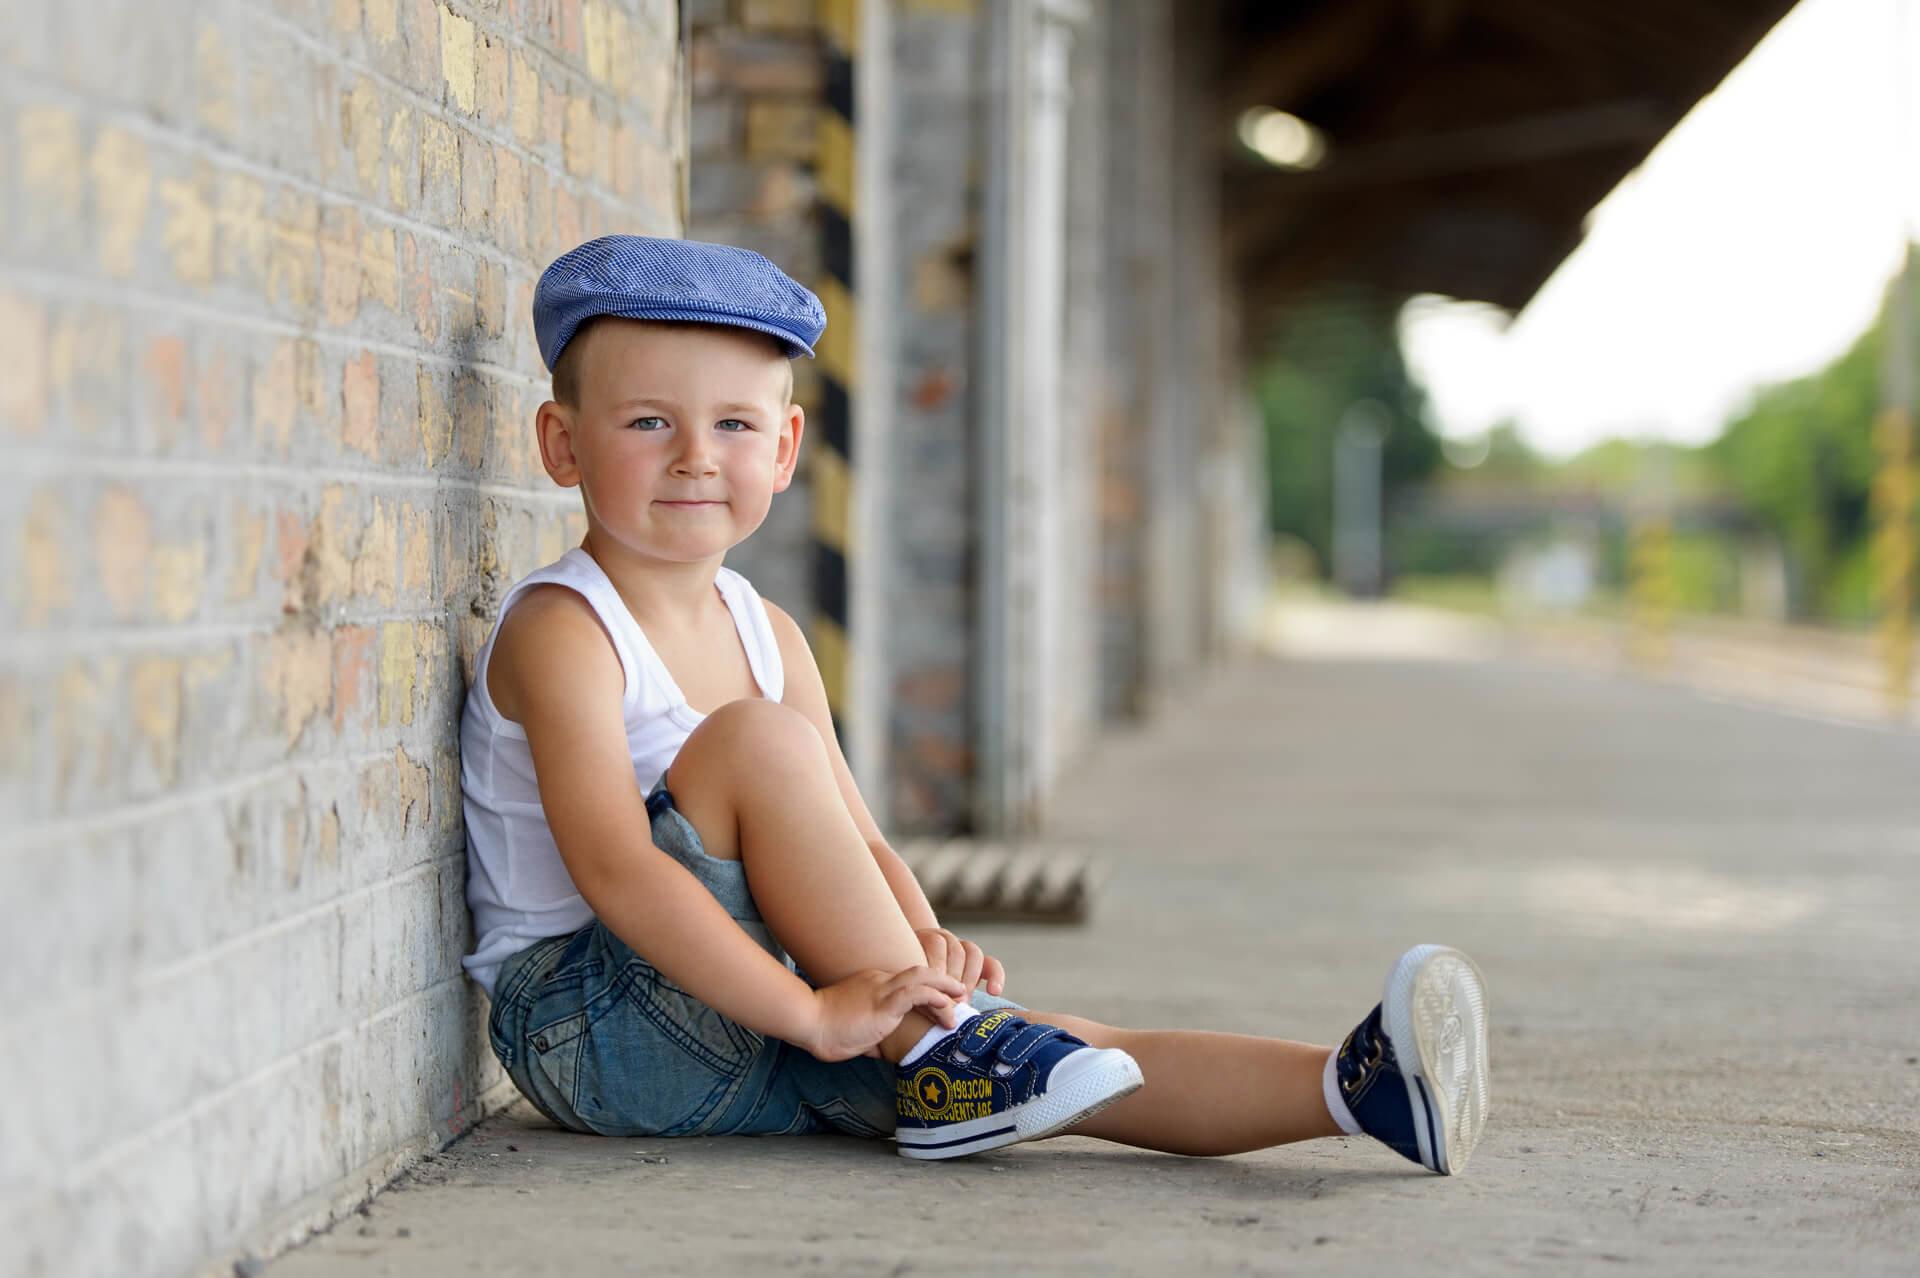 profesionalny fotograf Peter Norulak Kosice umelecke fotky deti exterier_18